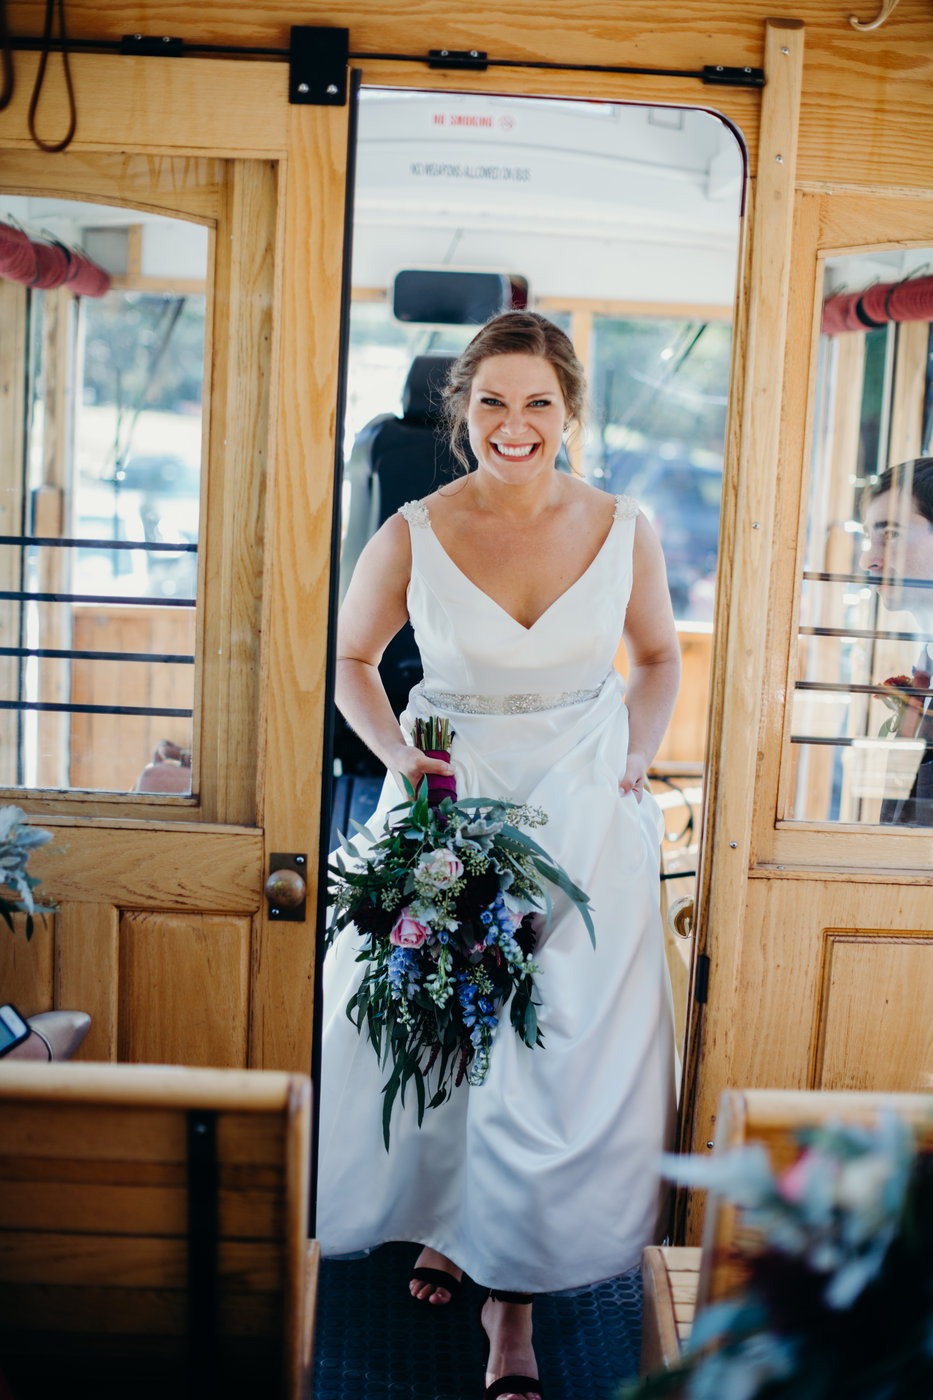 Ryan Jessica-Bridal Party-0210.jpg